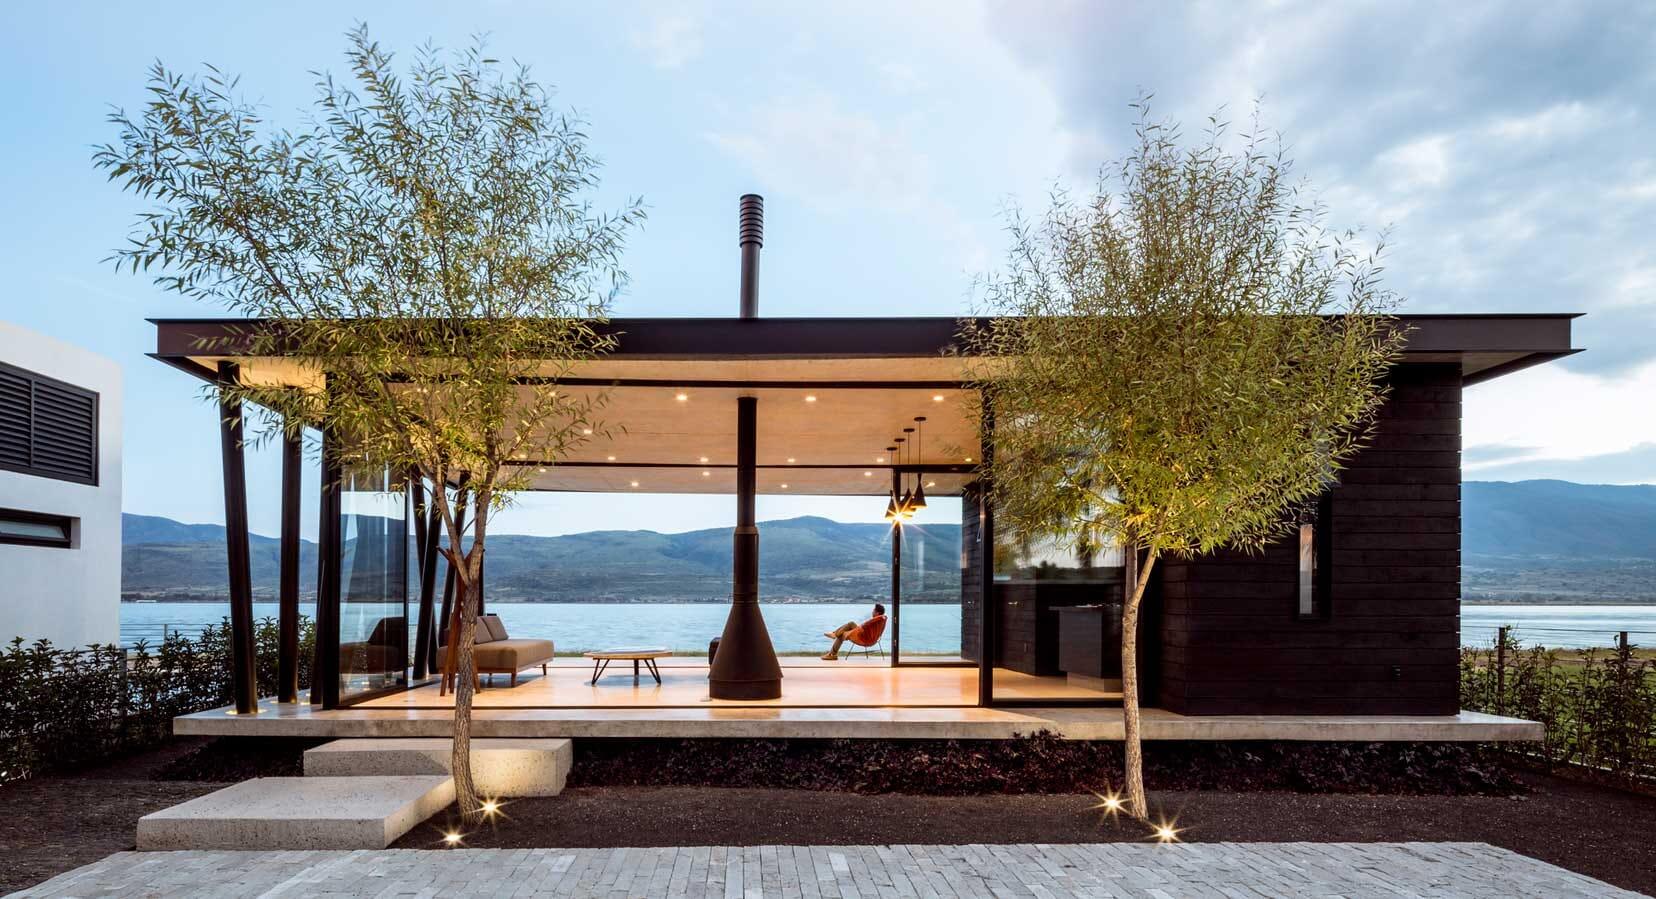 The F+G Cajititlán Terrace by Jaime Copado & Francisco Sarabia